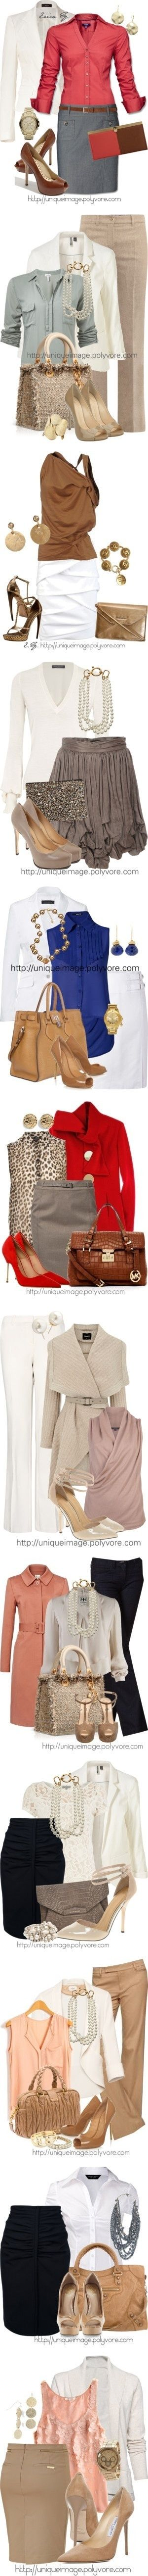 Fashion style...work attire ideas